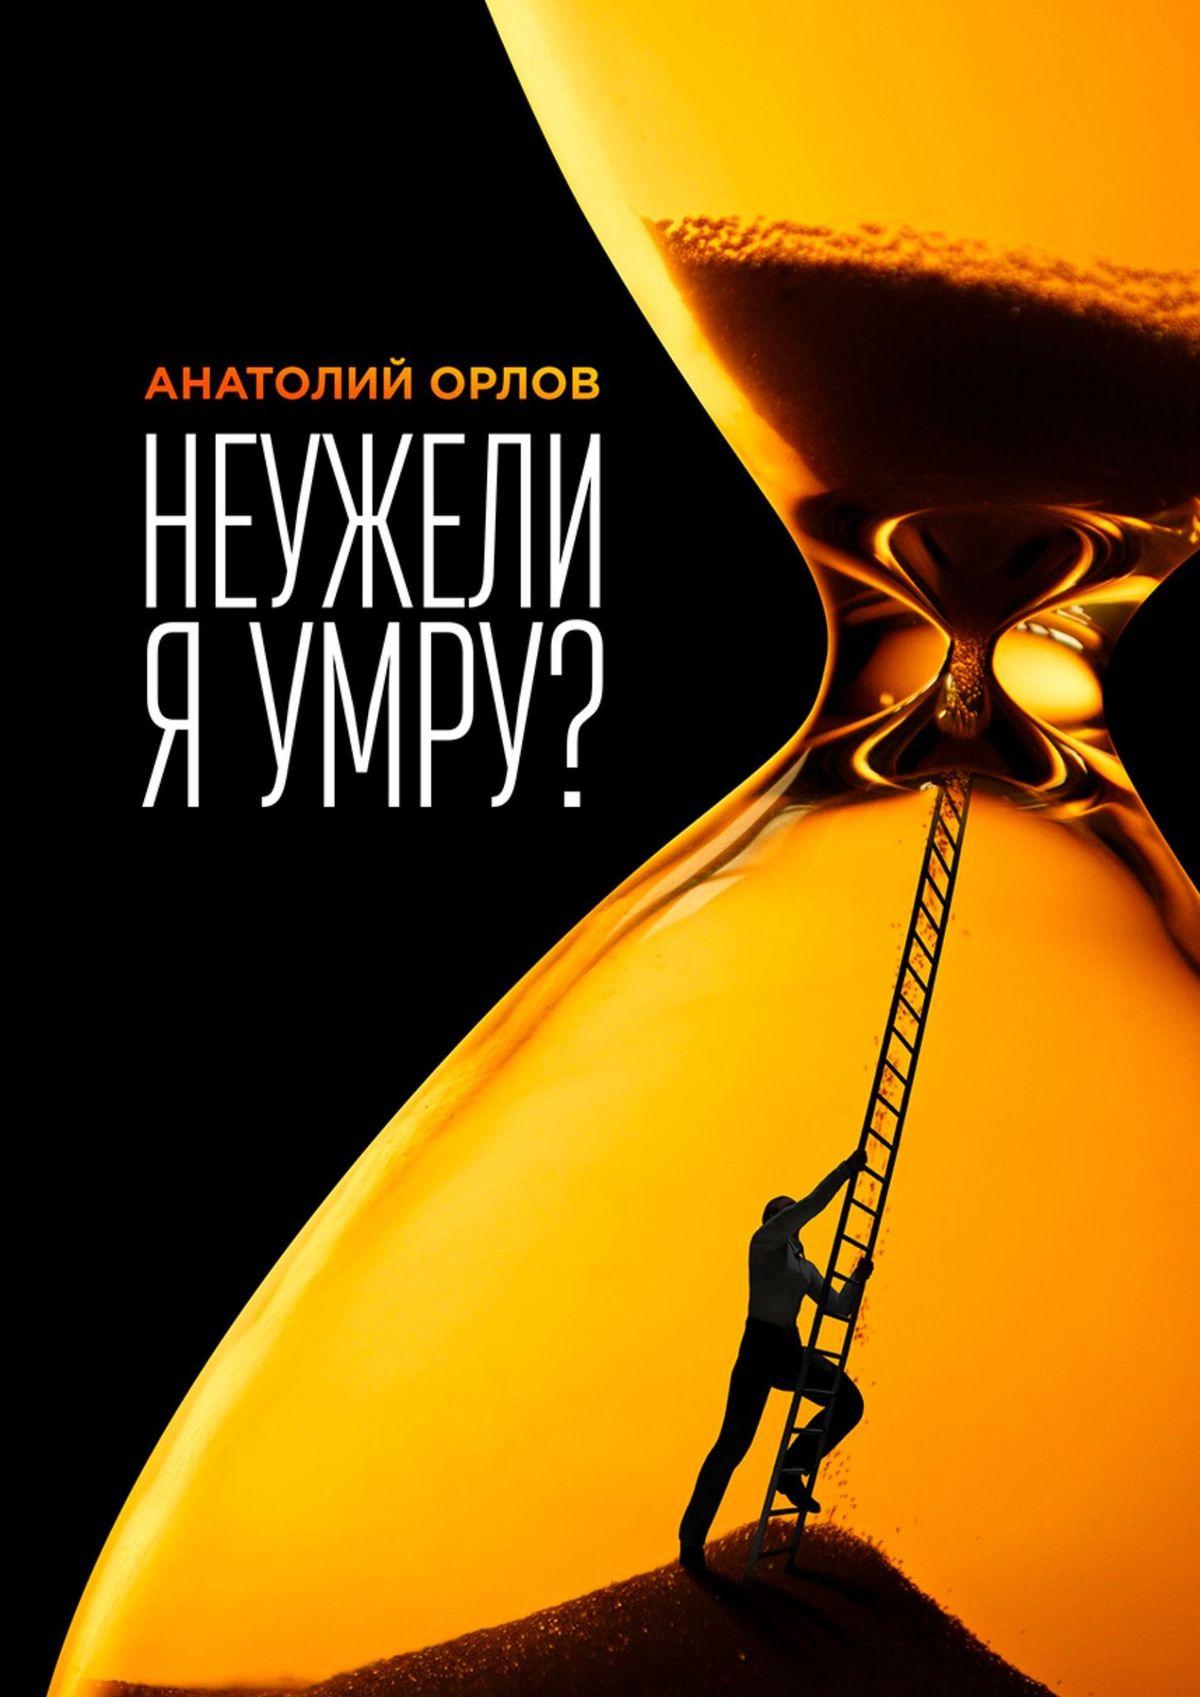 Анатолий Орлов Неужели я умру?